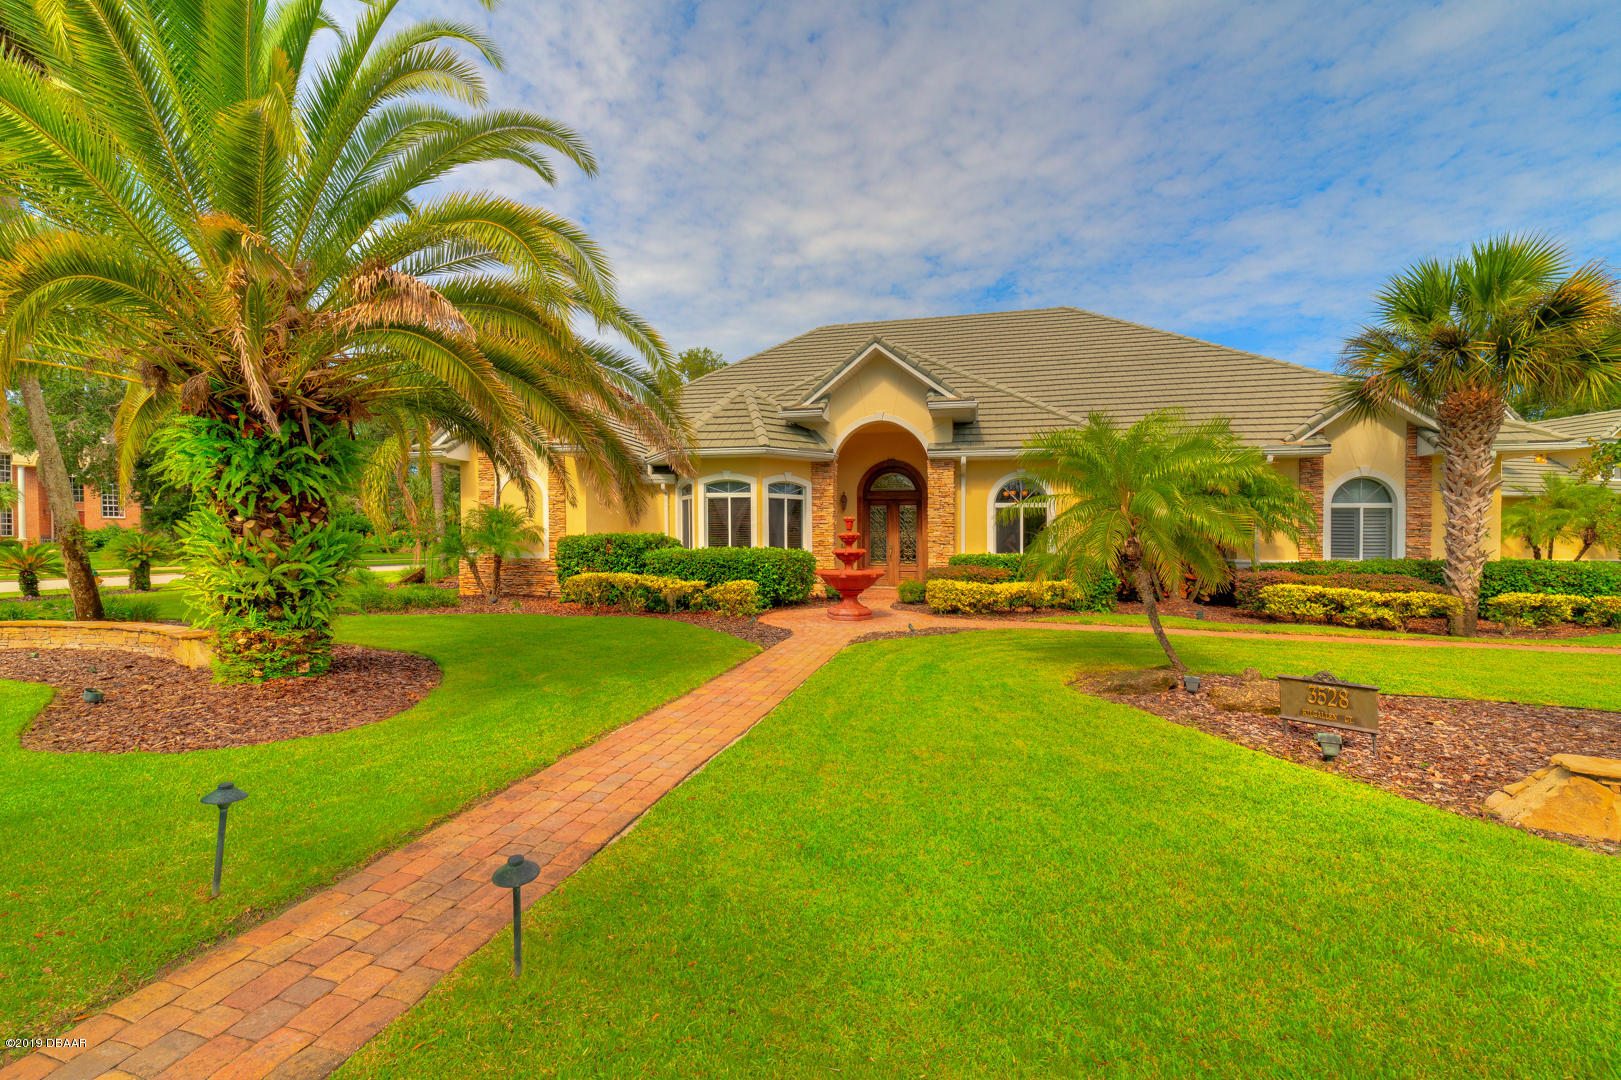 Photo of 3528 Kilgallen Court, Ormond Beach, FL 32174